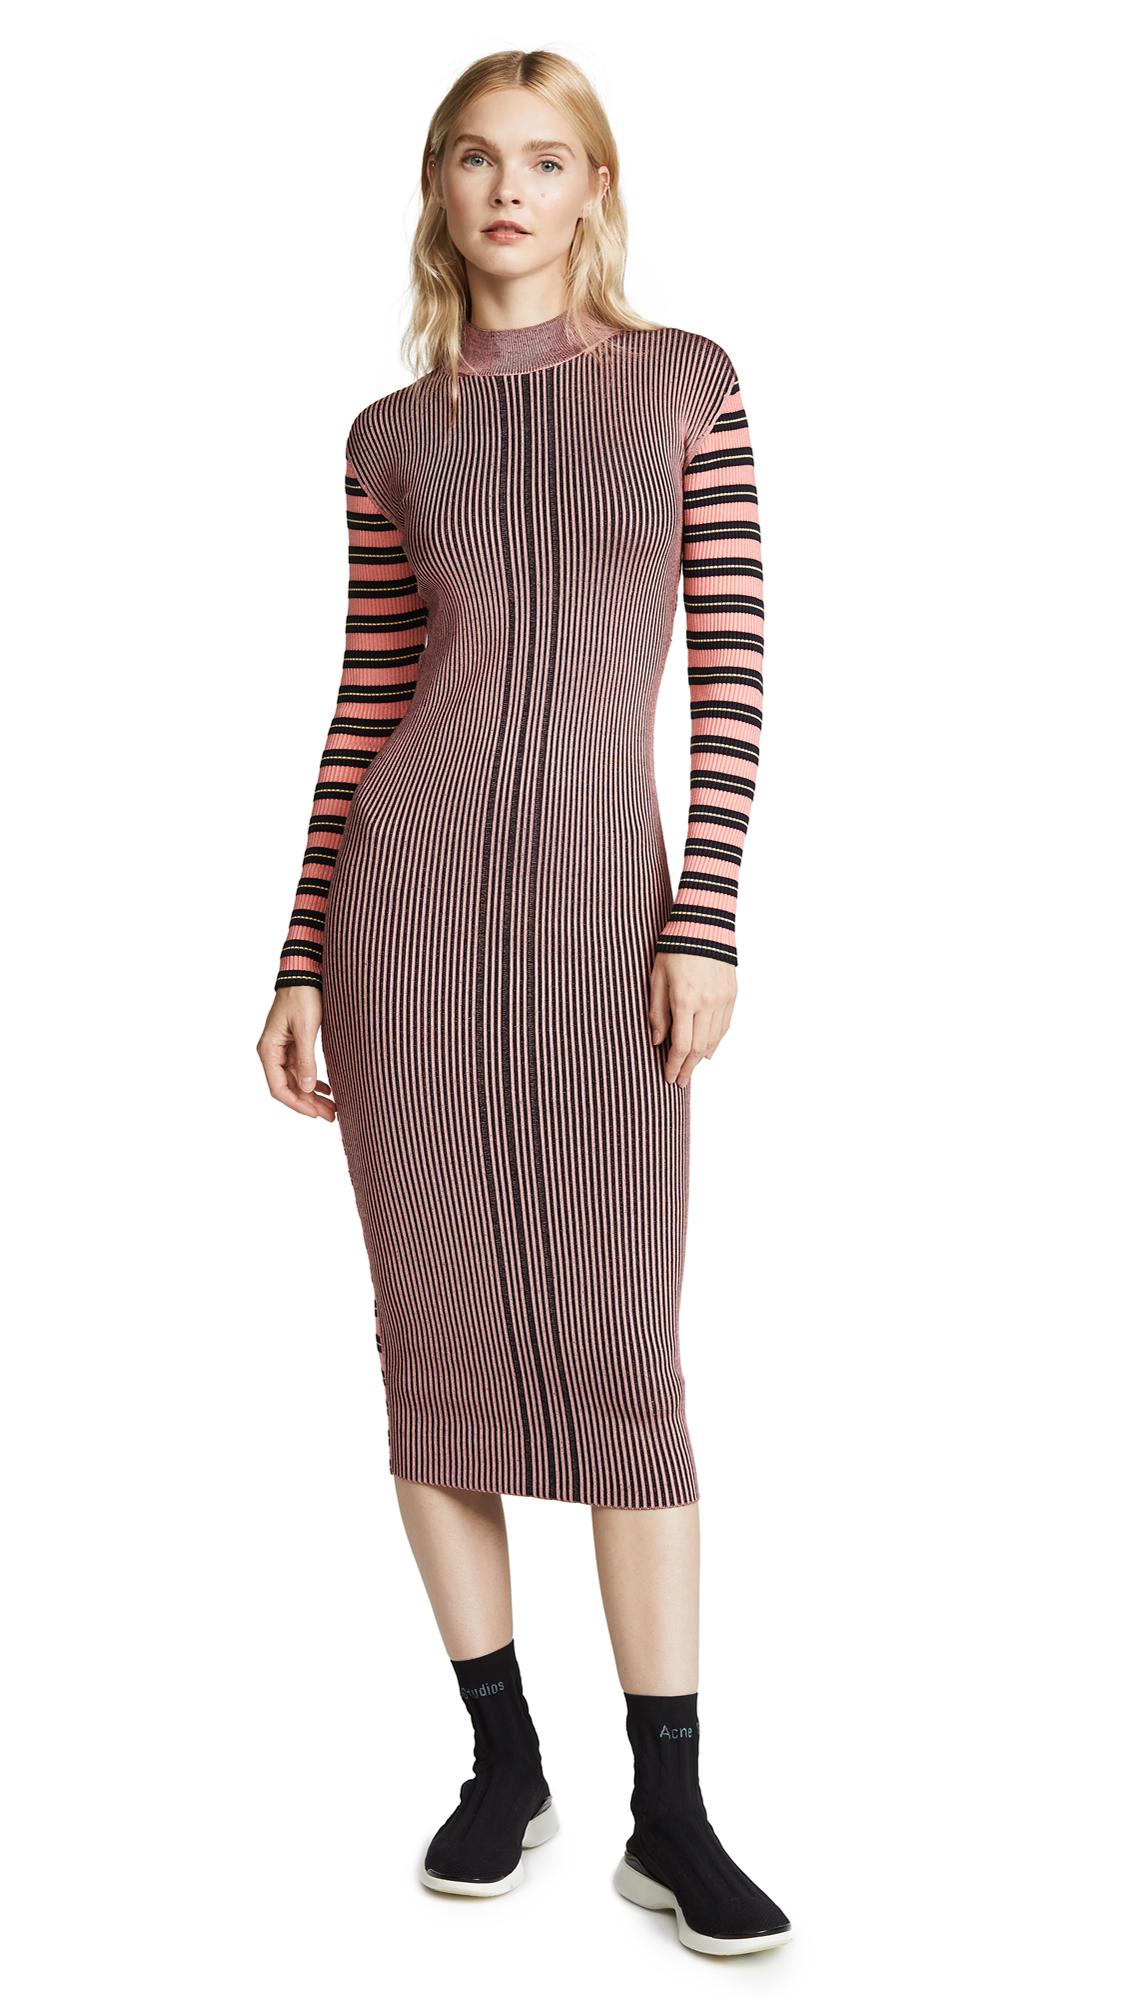 McQ - Alexander McQueen Ribbed Midi Dress In Fondant Pink